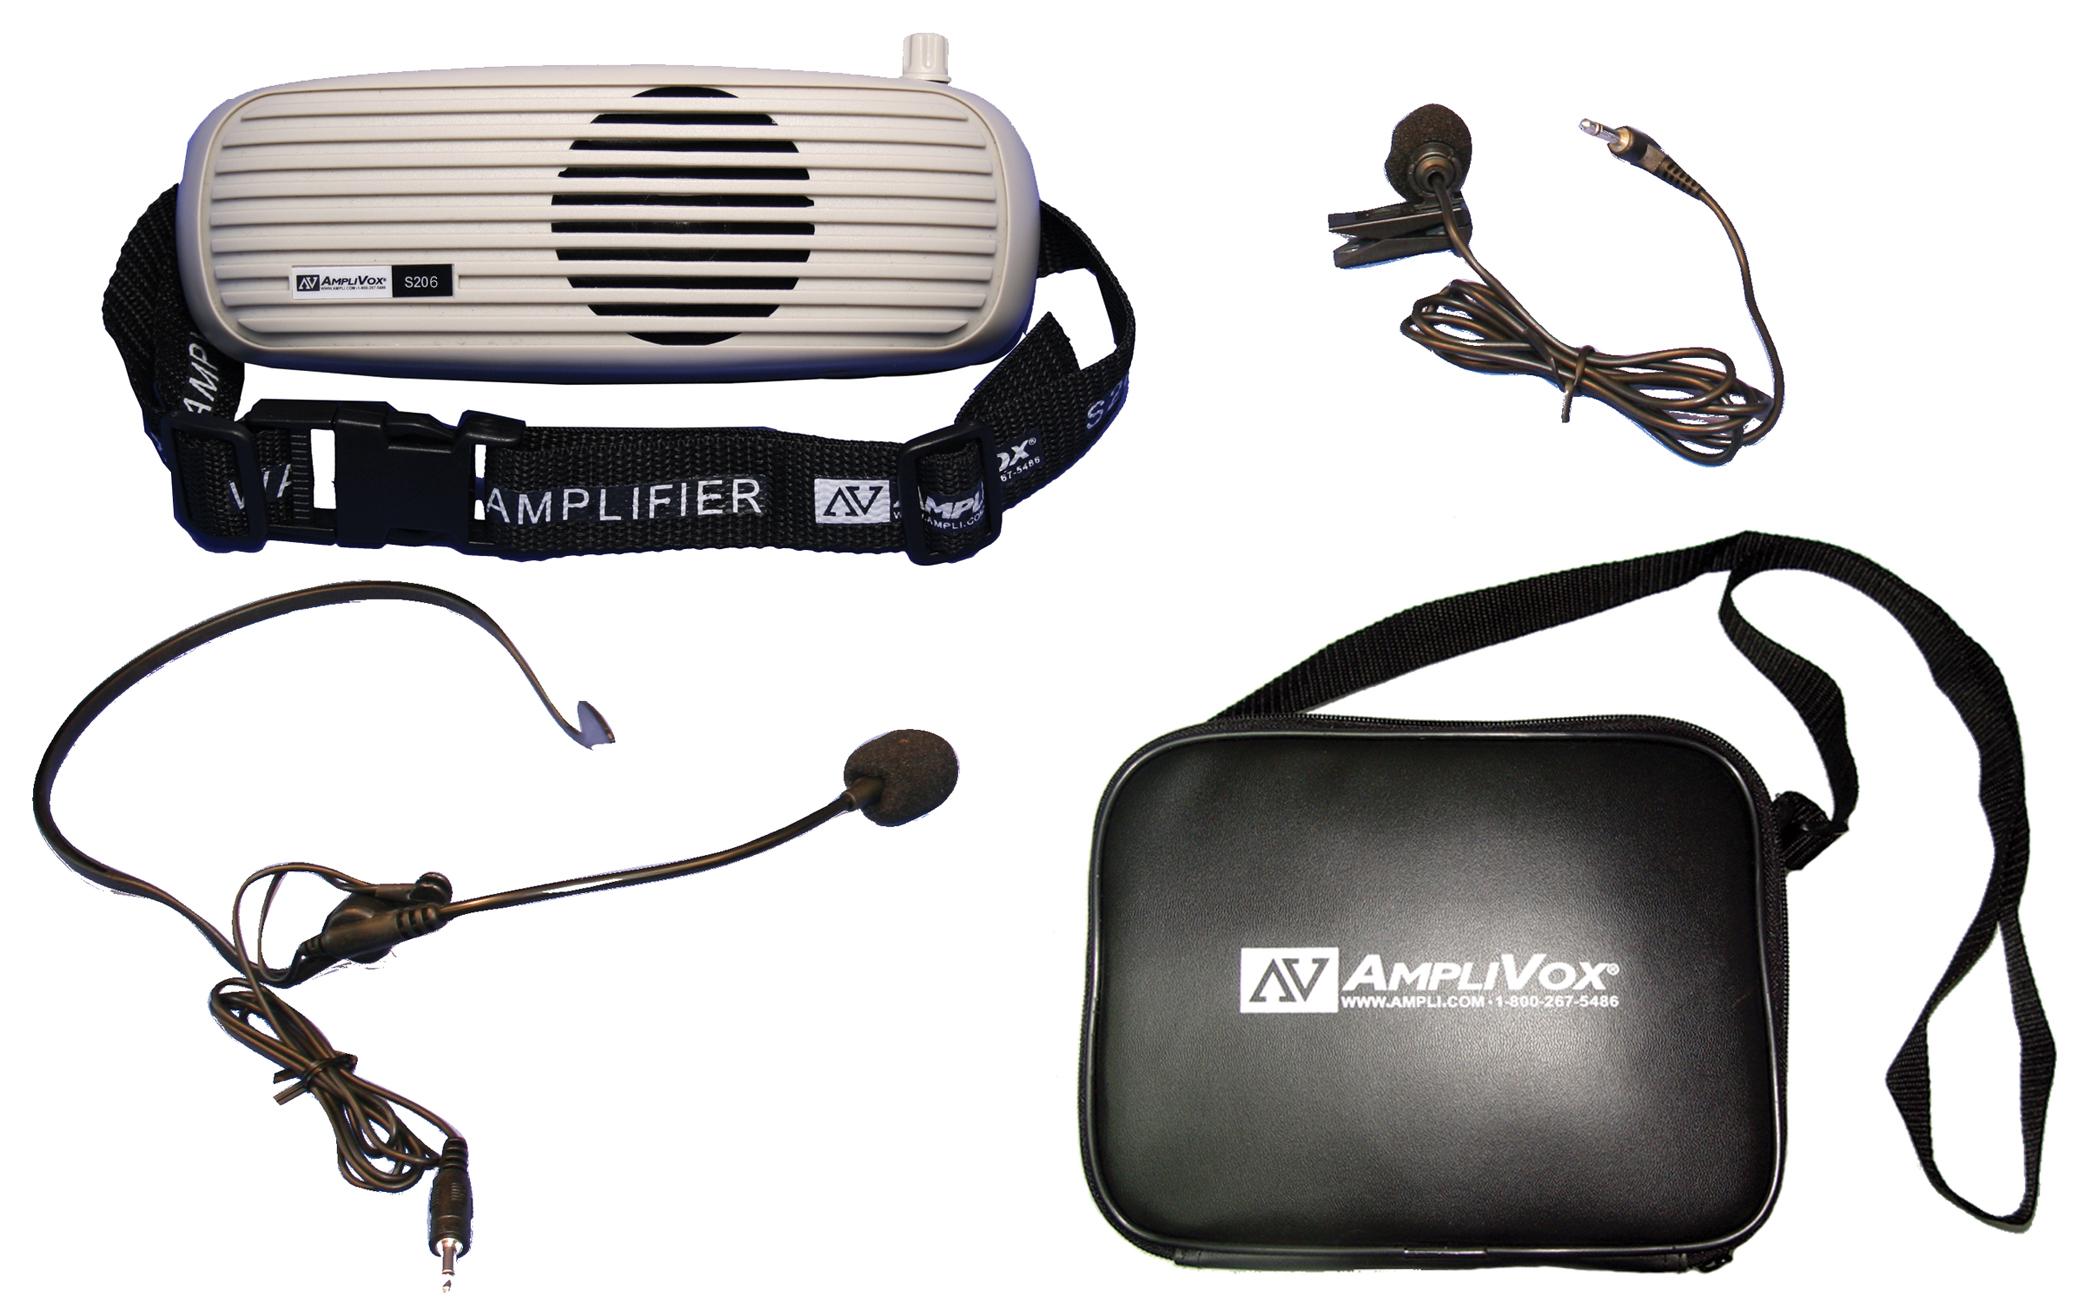 AmpliVox S206 BeltBlaster Personal Amplifier